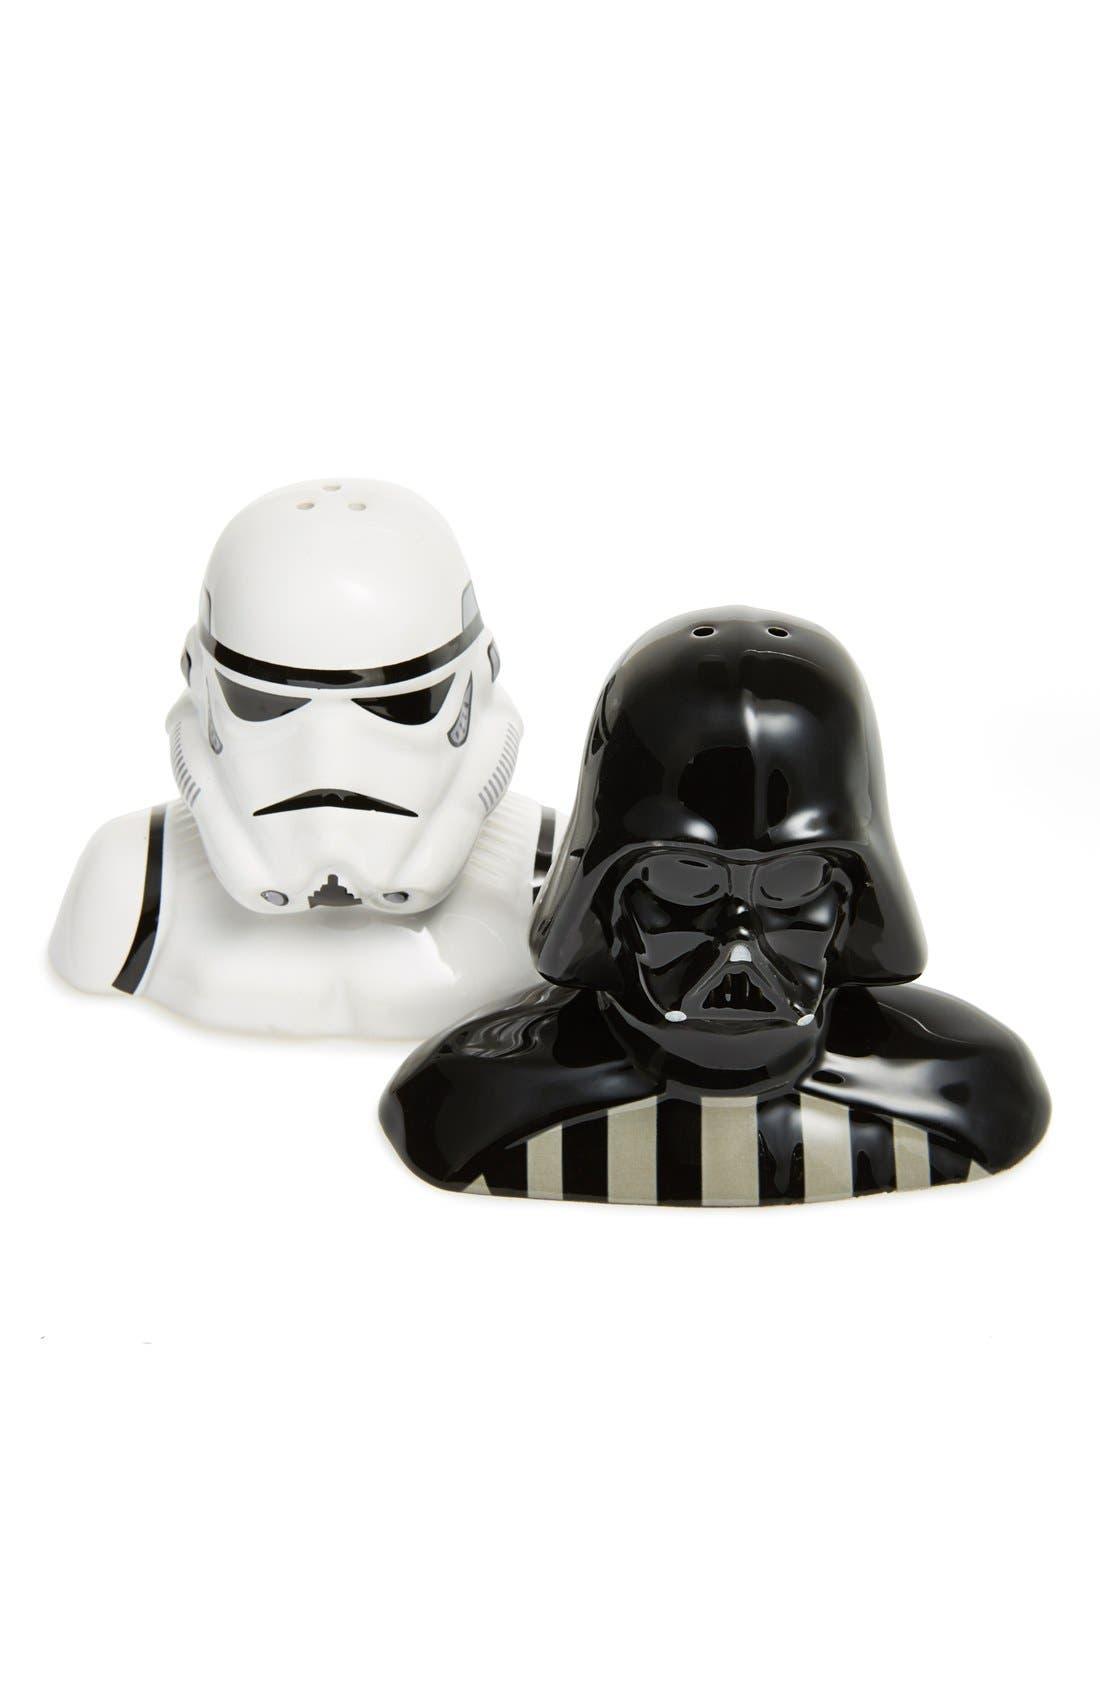 Main Image - Vandor Star Wars Salt & Pepper Shakers